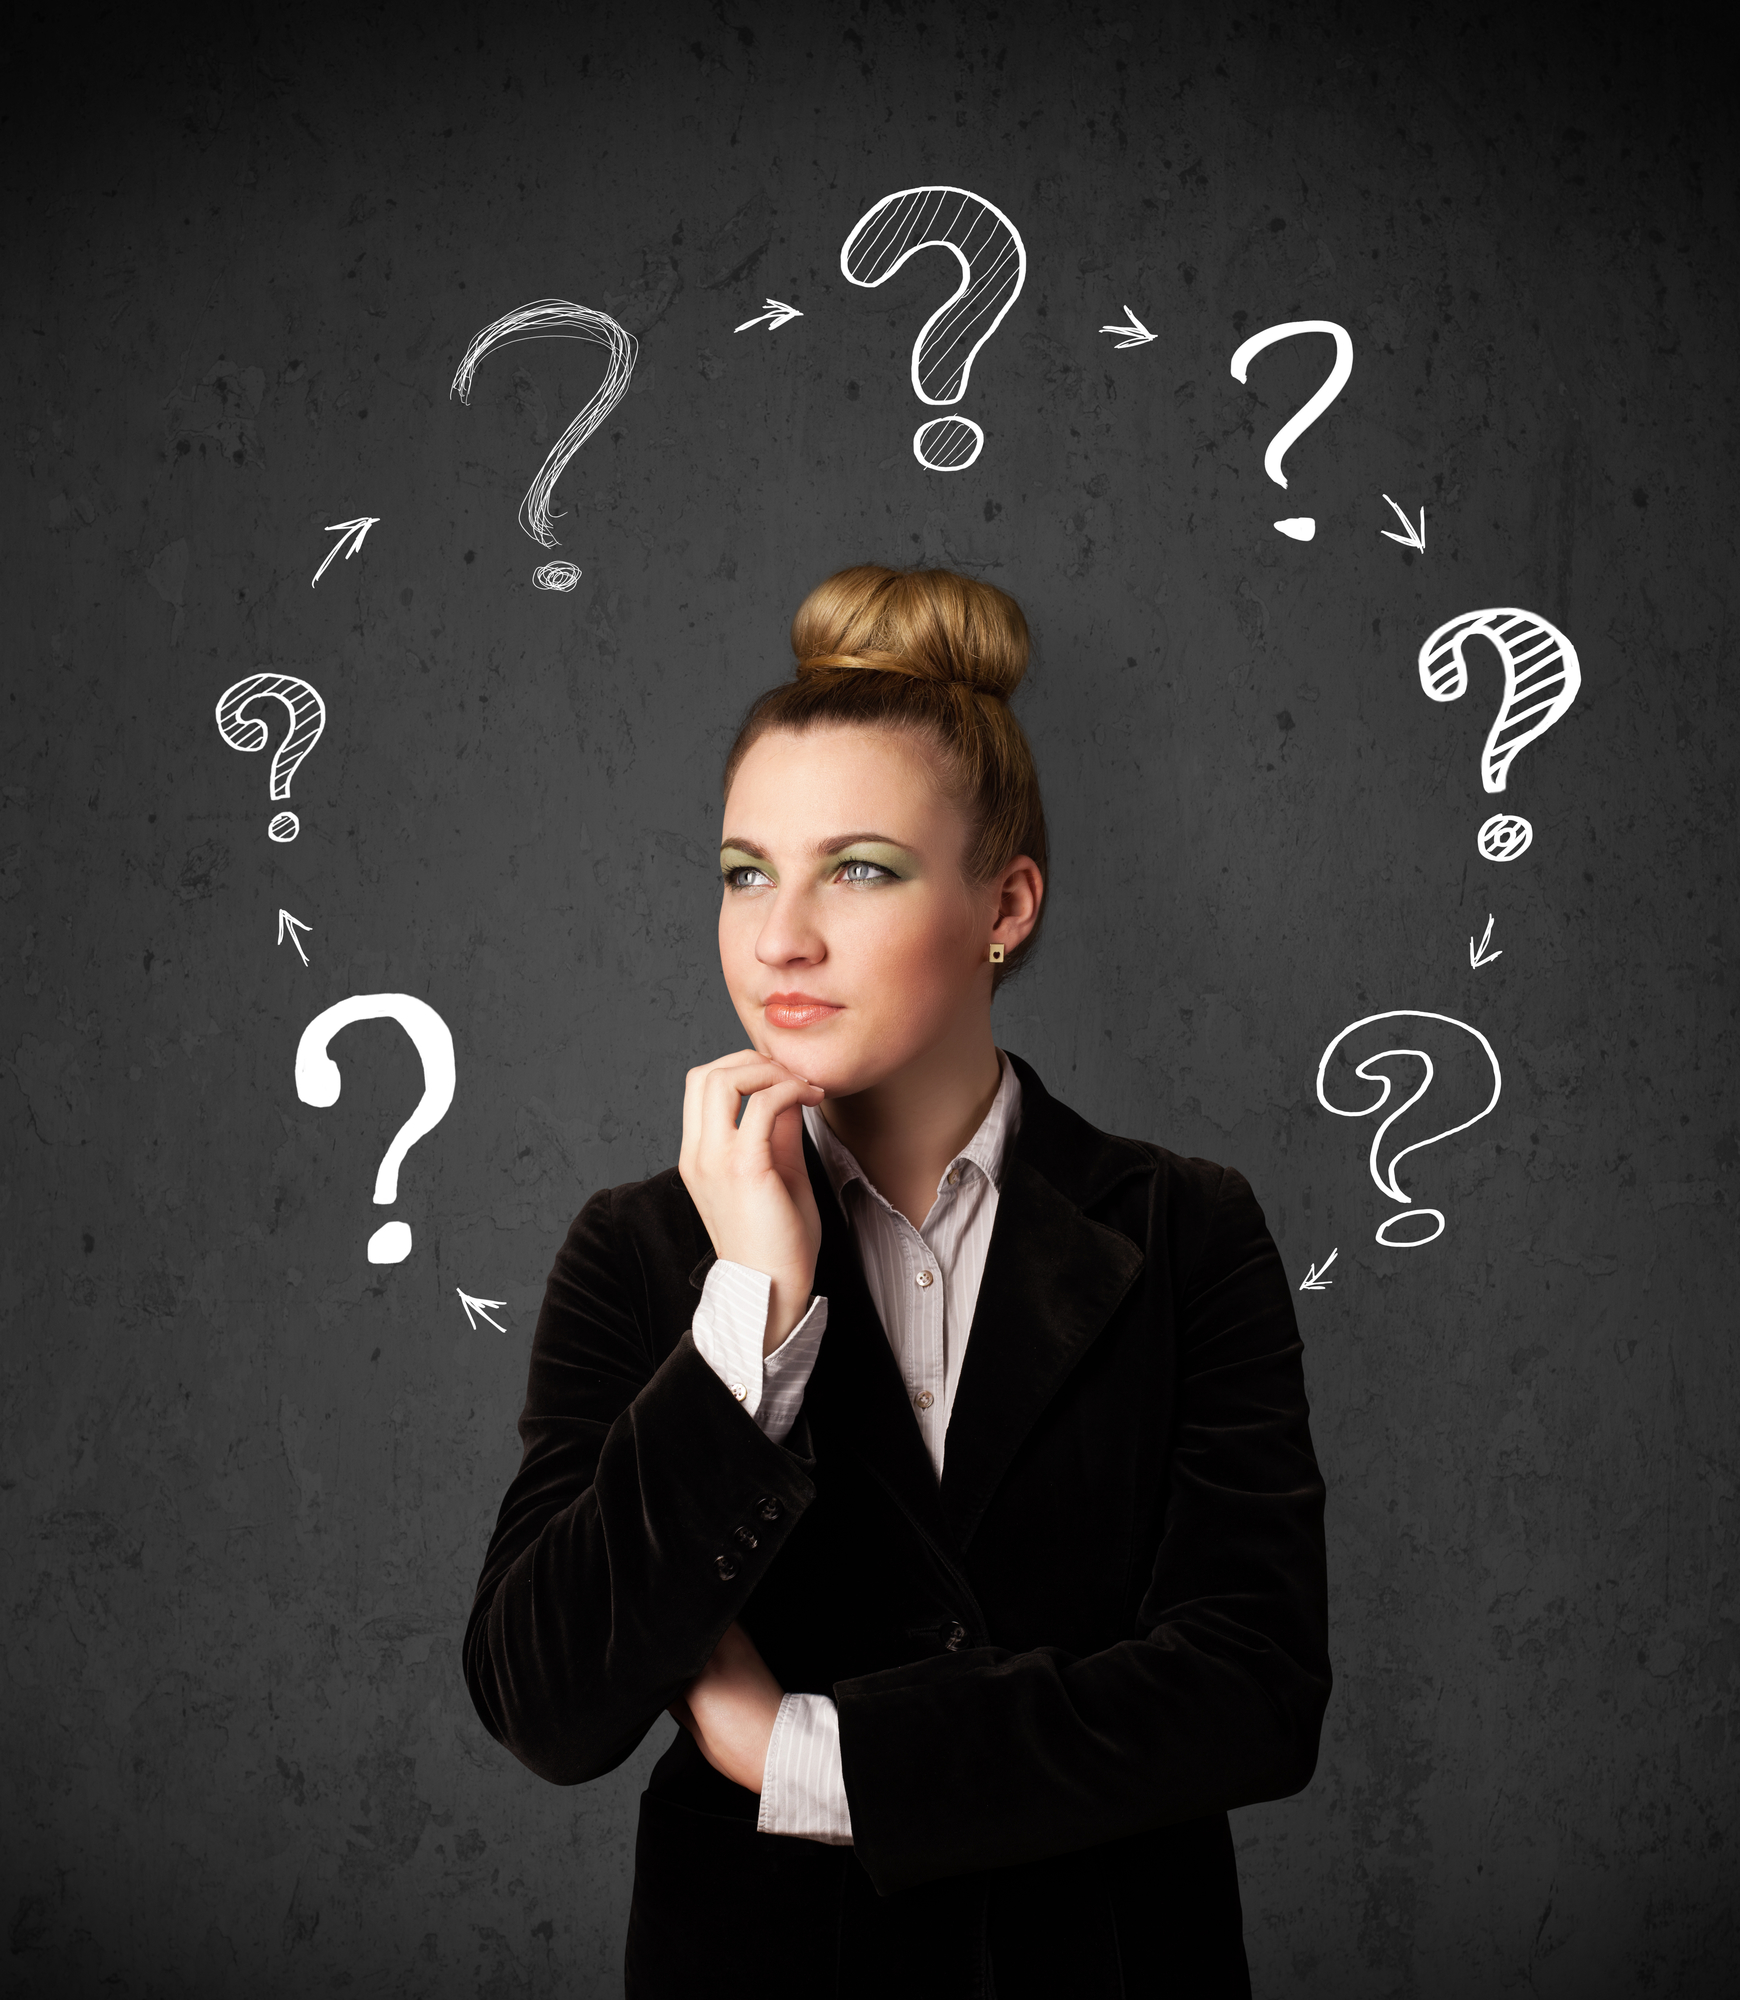 Does #noestimates really mean no estimates? | PMWorld 360 Magazine